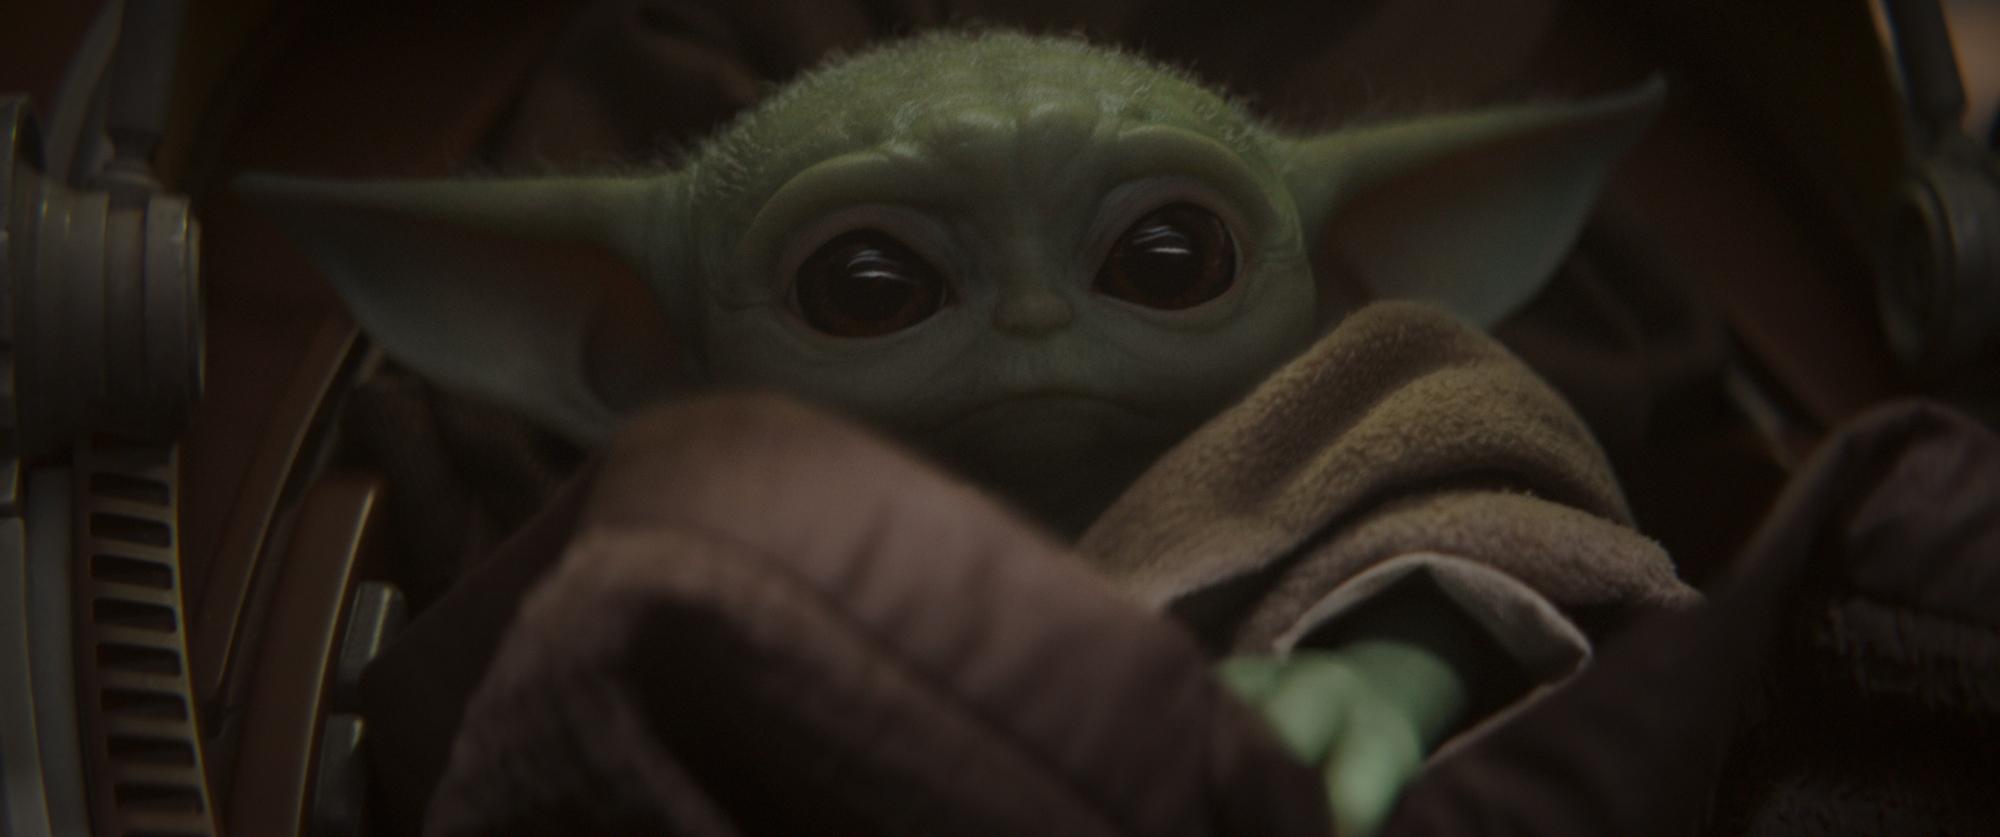 My Take: Baby Yoda for President